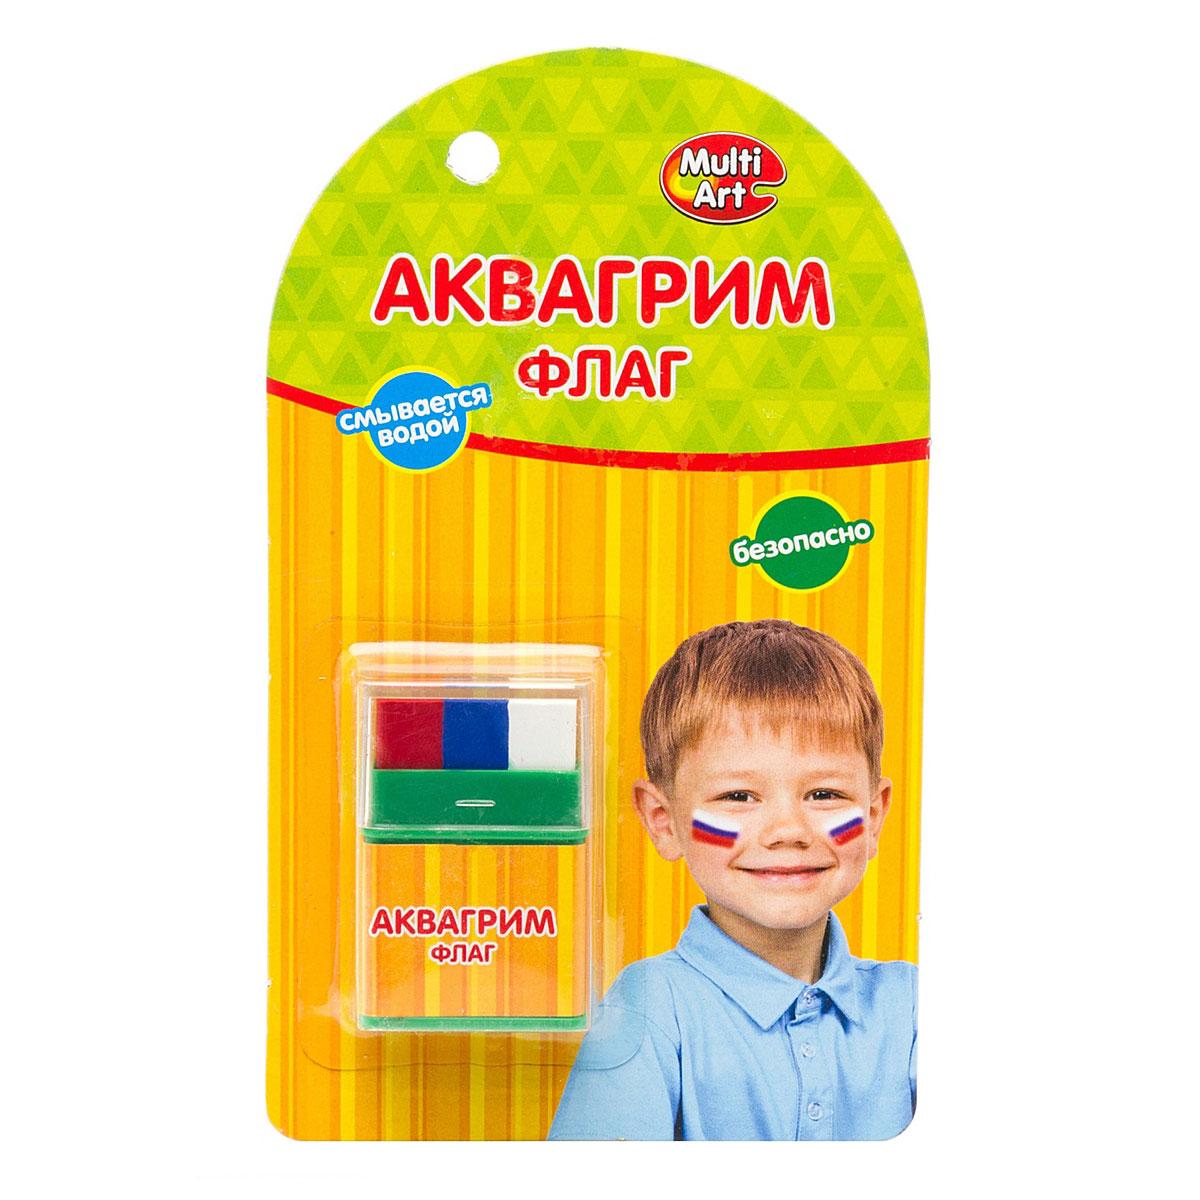 Аквагрим Multiart Мелки 3 цвета Флаг<br>